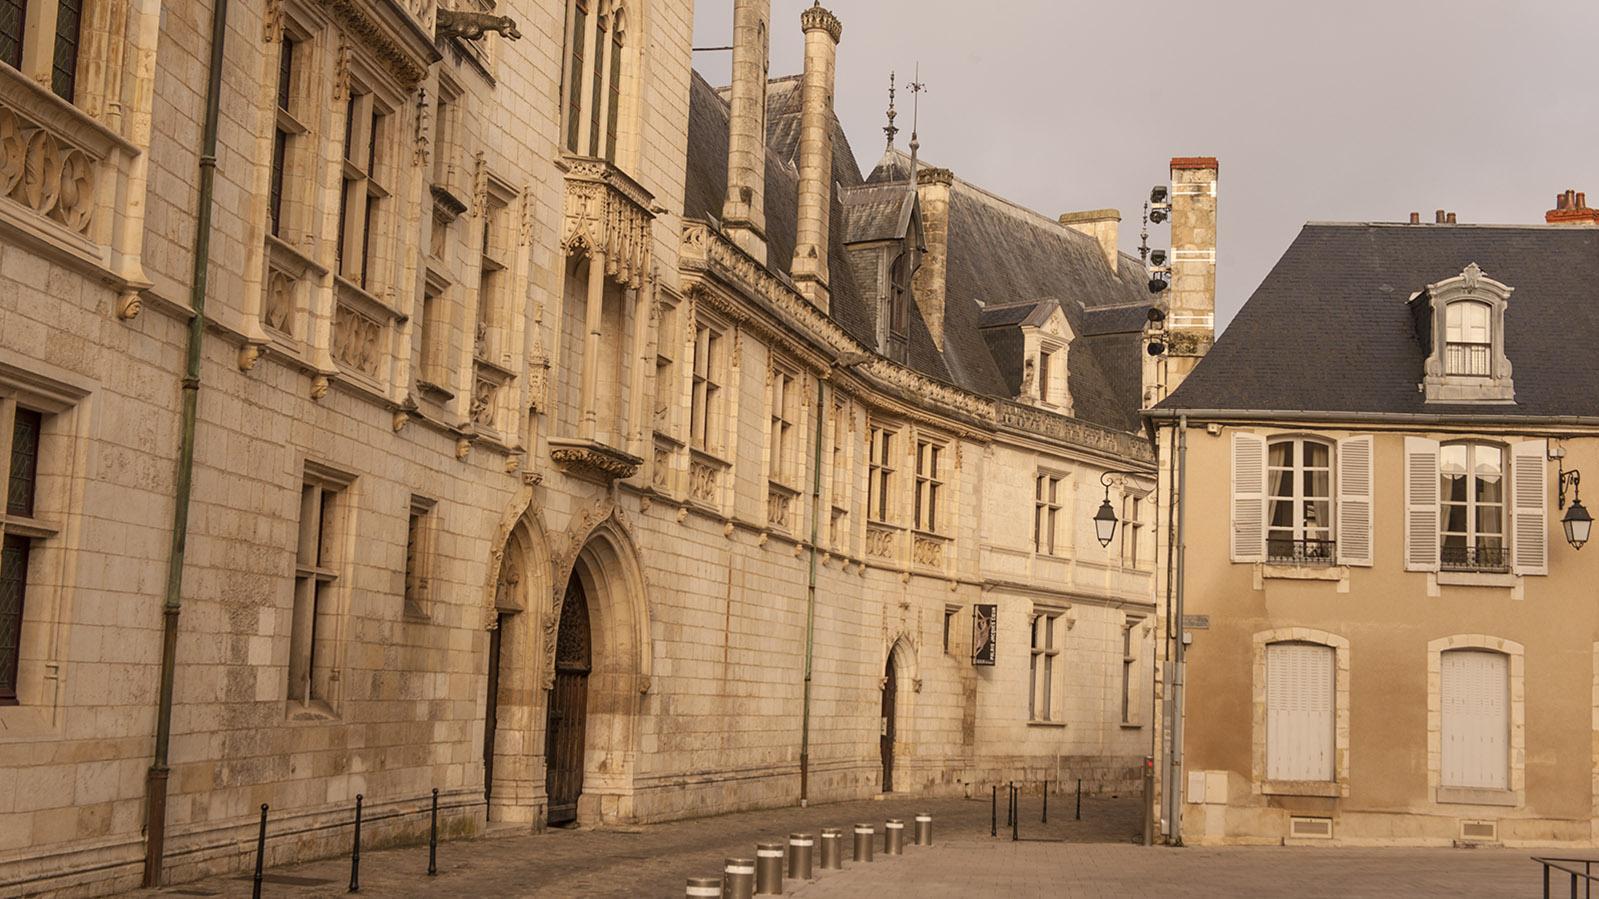 Der Palais Jacques Cœur von Bourges, der alten Hauptstadt des Berry. Foto: Hilke Maunder